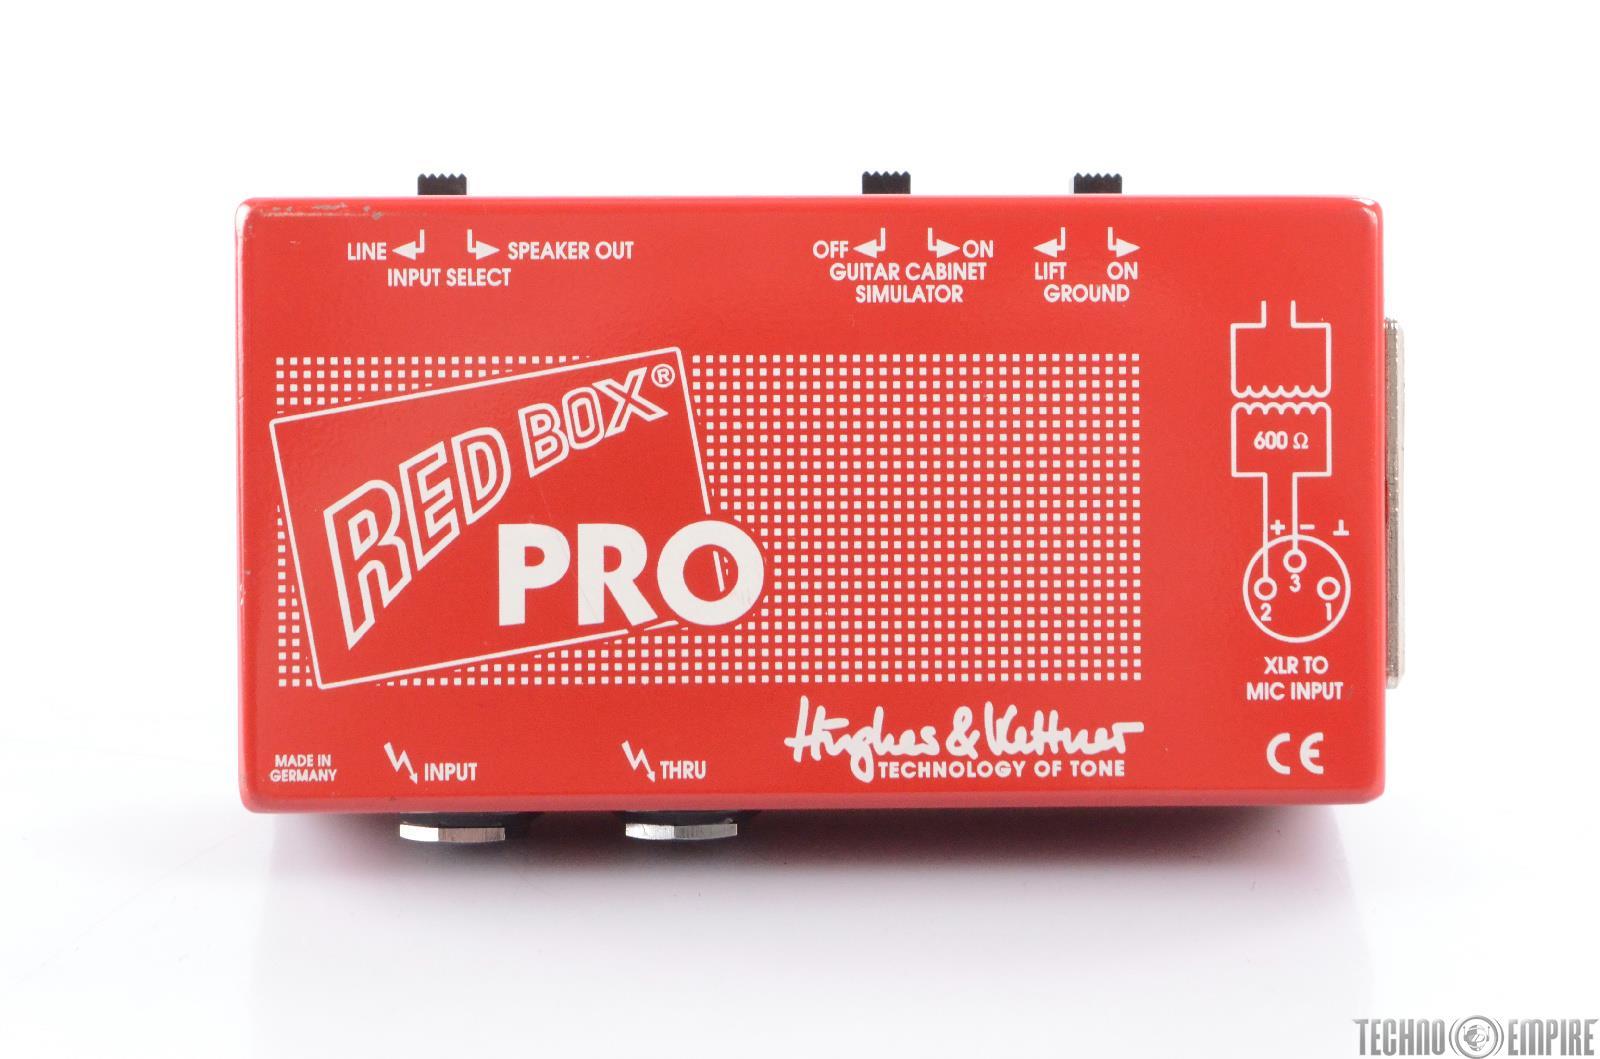 hughes kettner red box pro direct box di with guitar cabinet simulator 23826 ebay. Black Bedroom Furniture Sets. Home Design Ideas